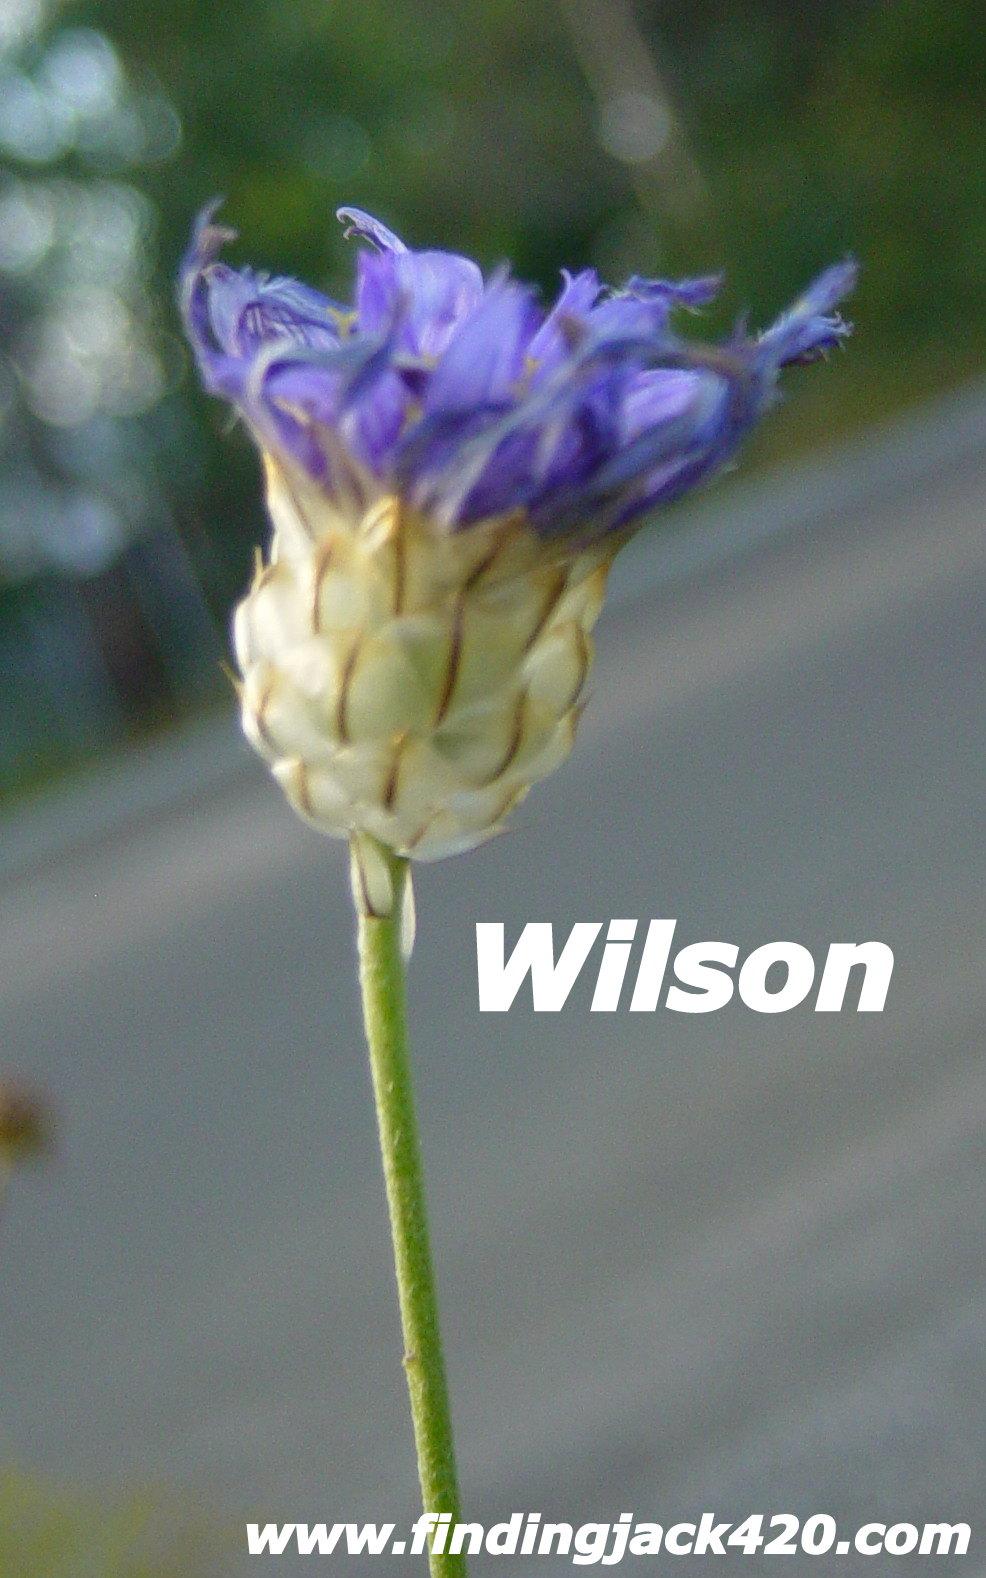 1-Wilson 2..jpg